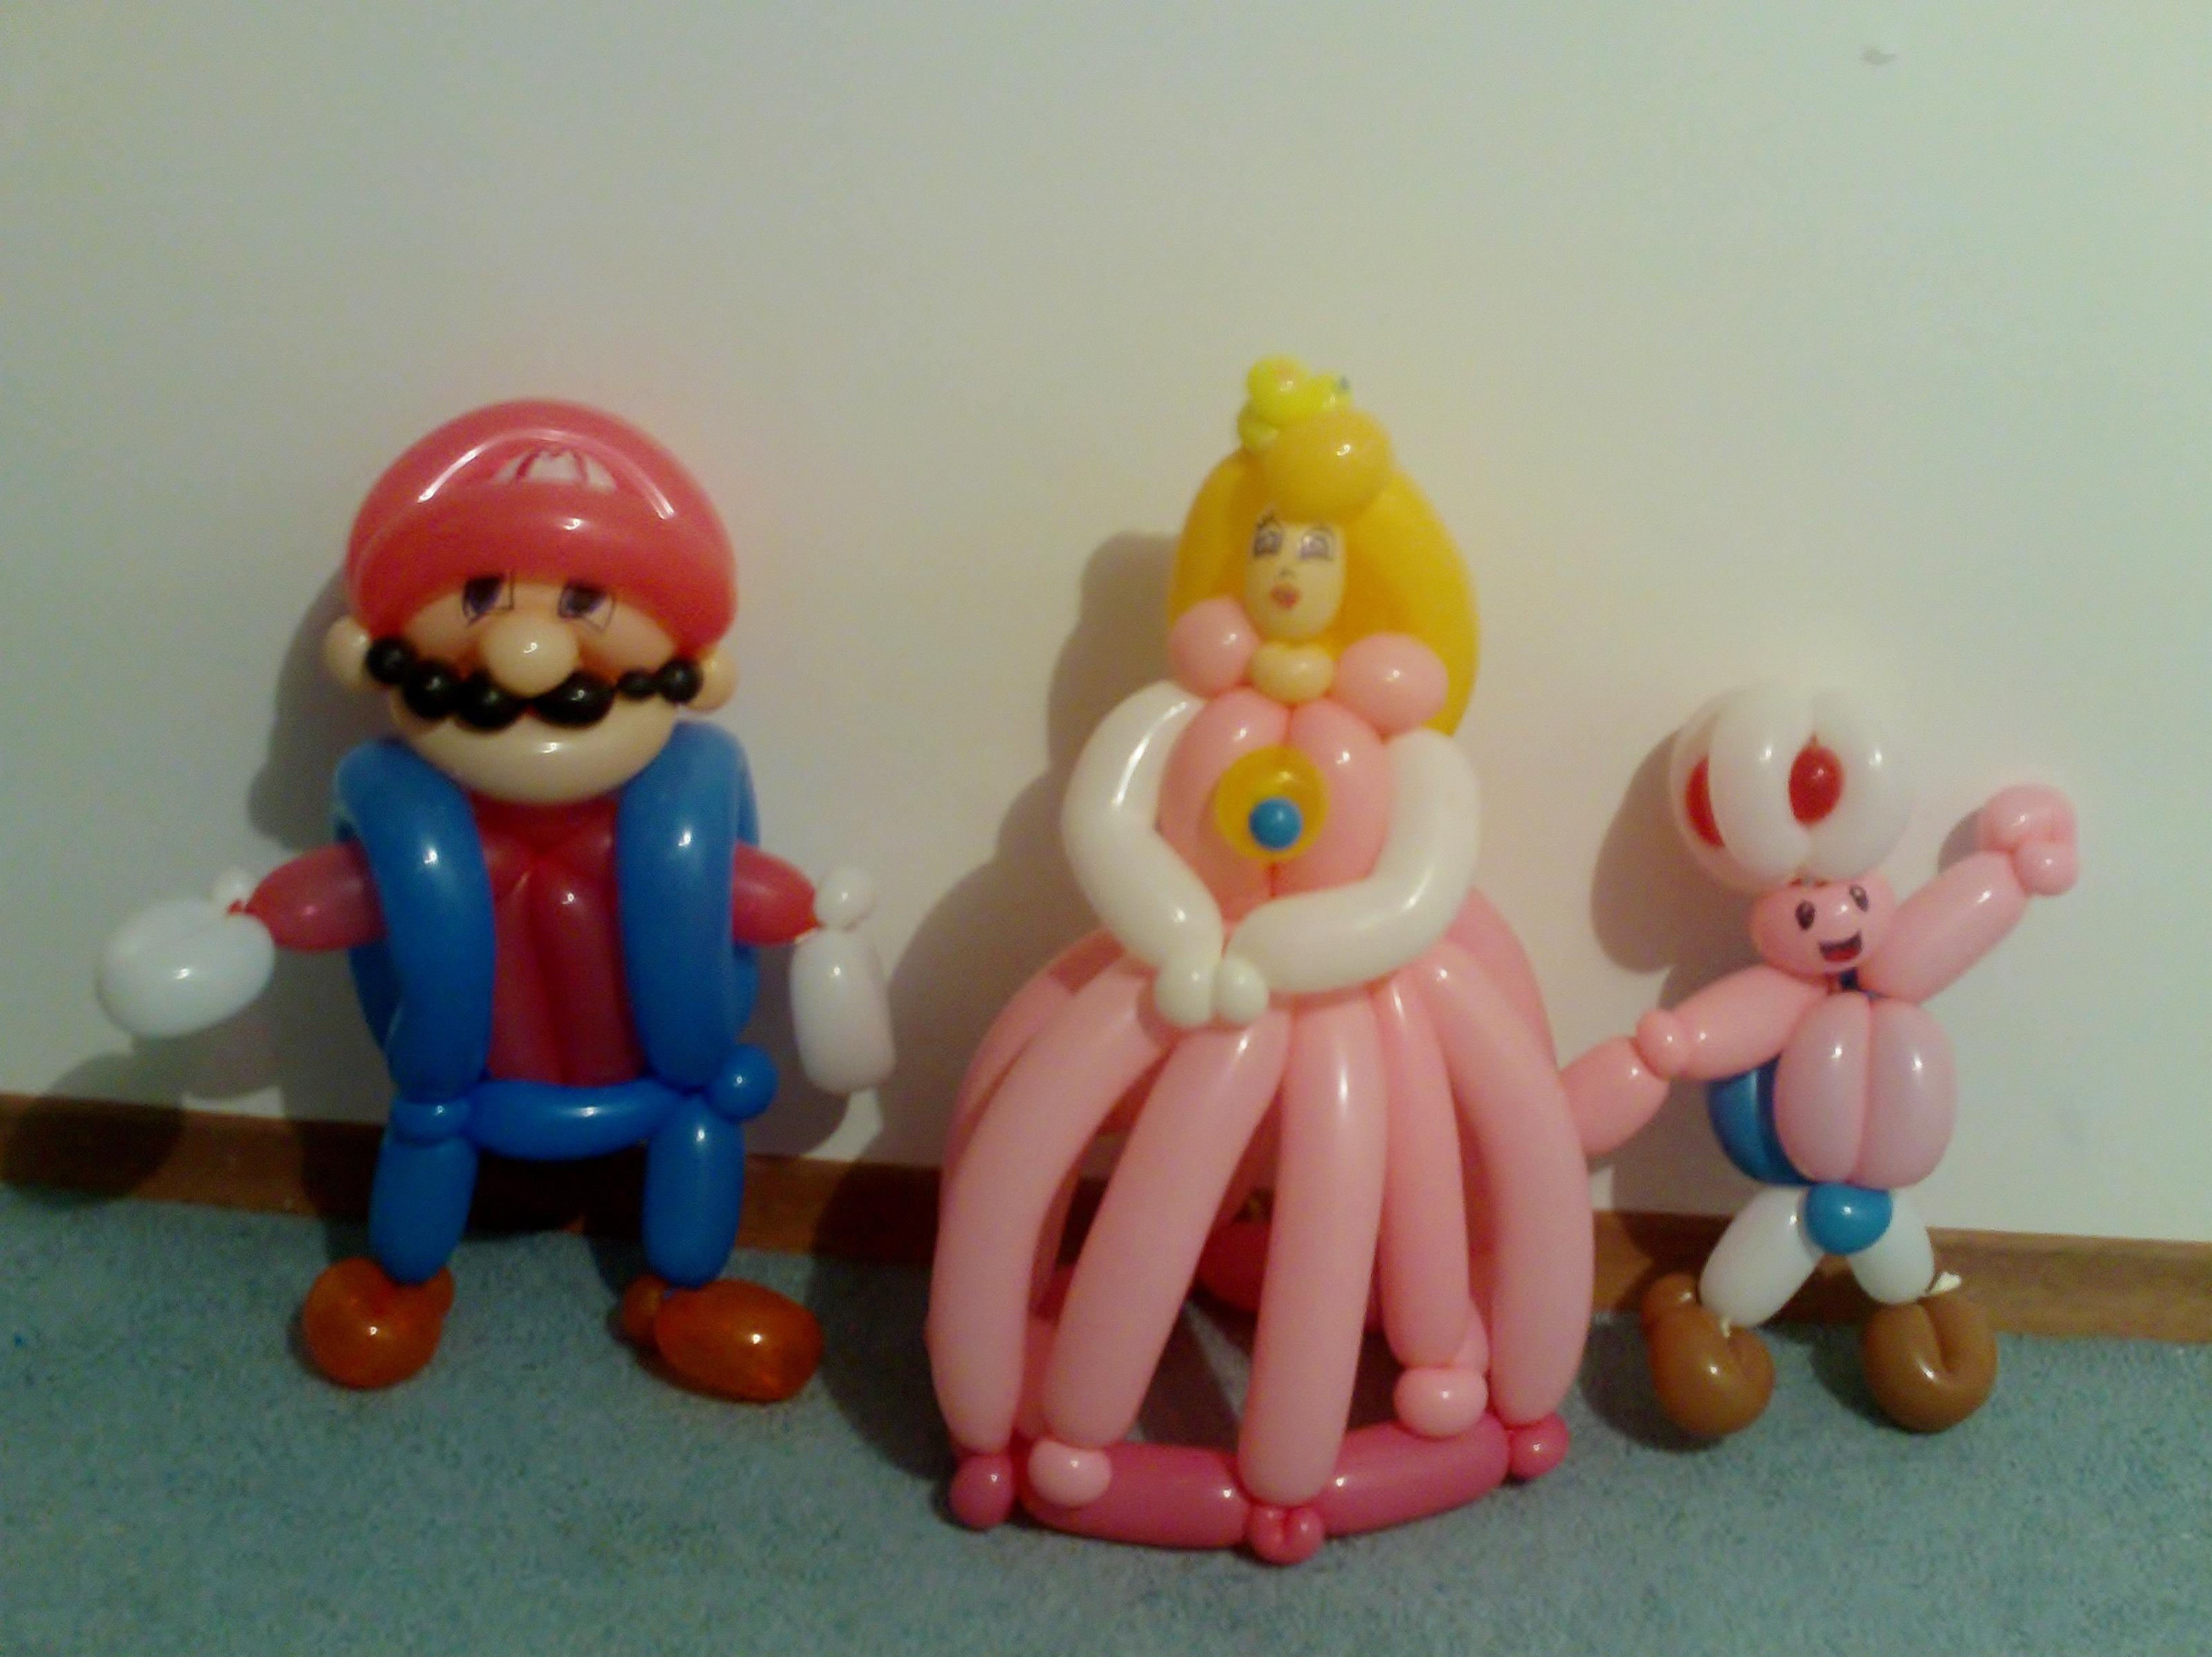 Heroes of the Mushroom Kingdom by TaylorTheAdequate